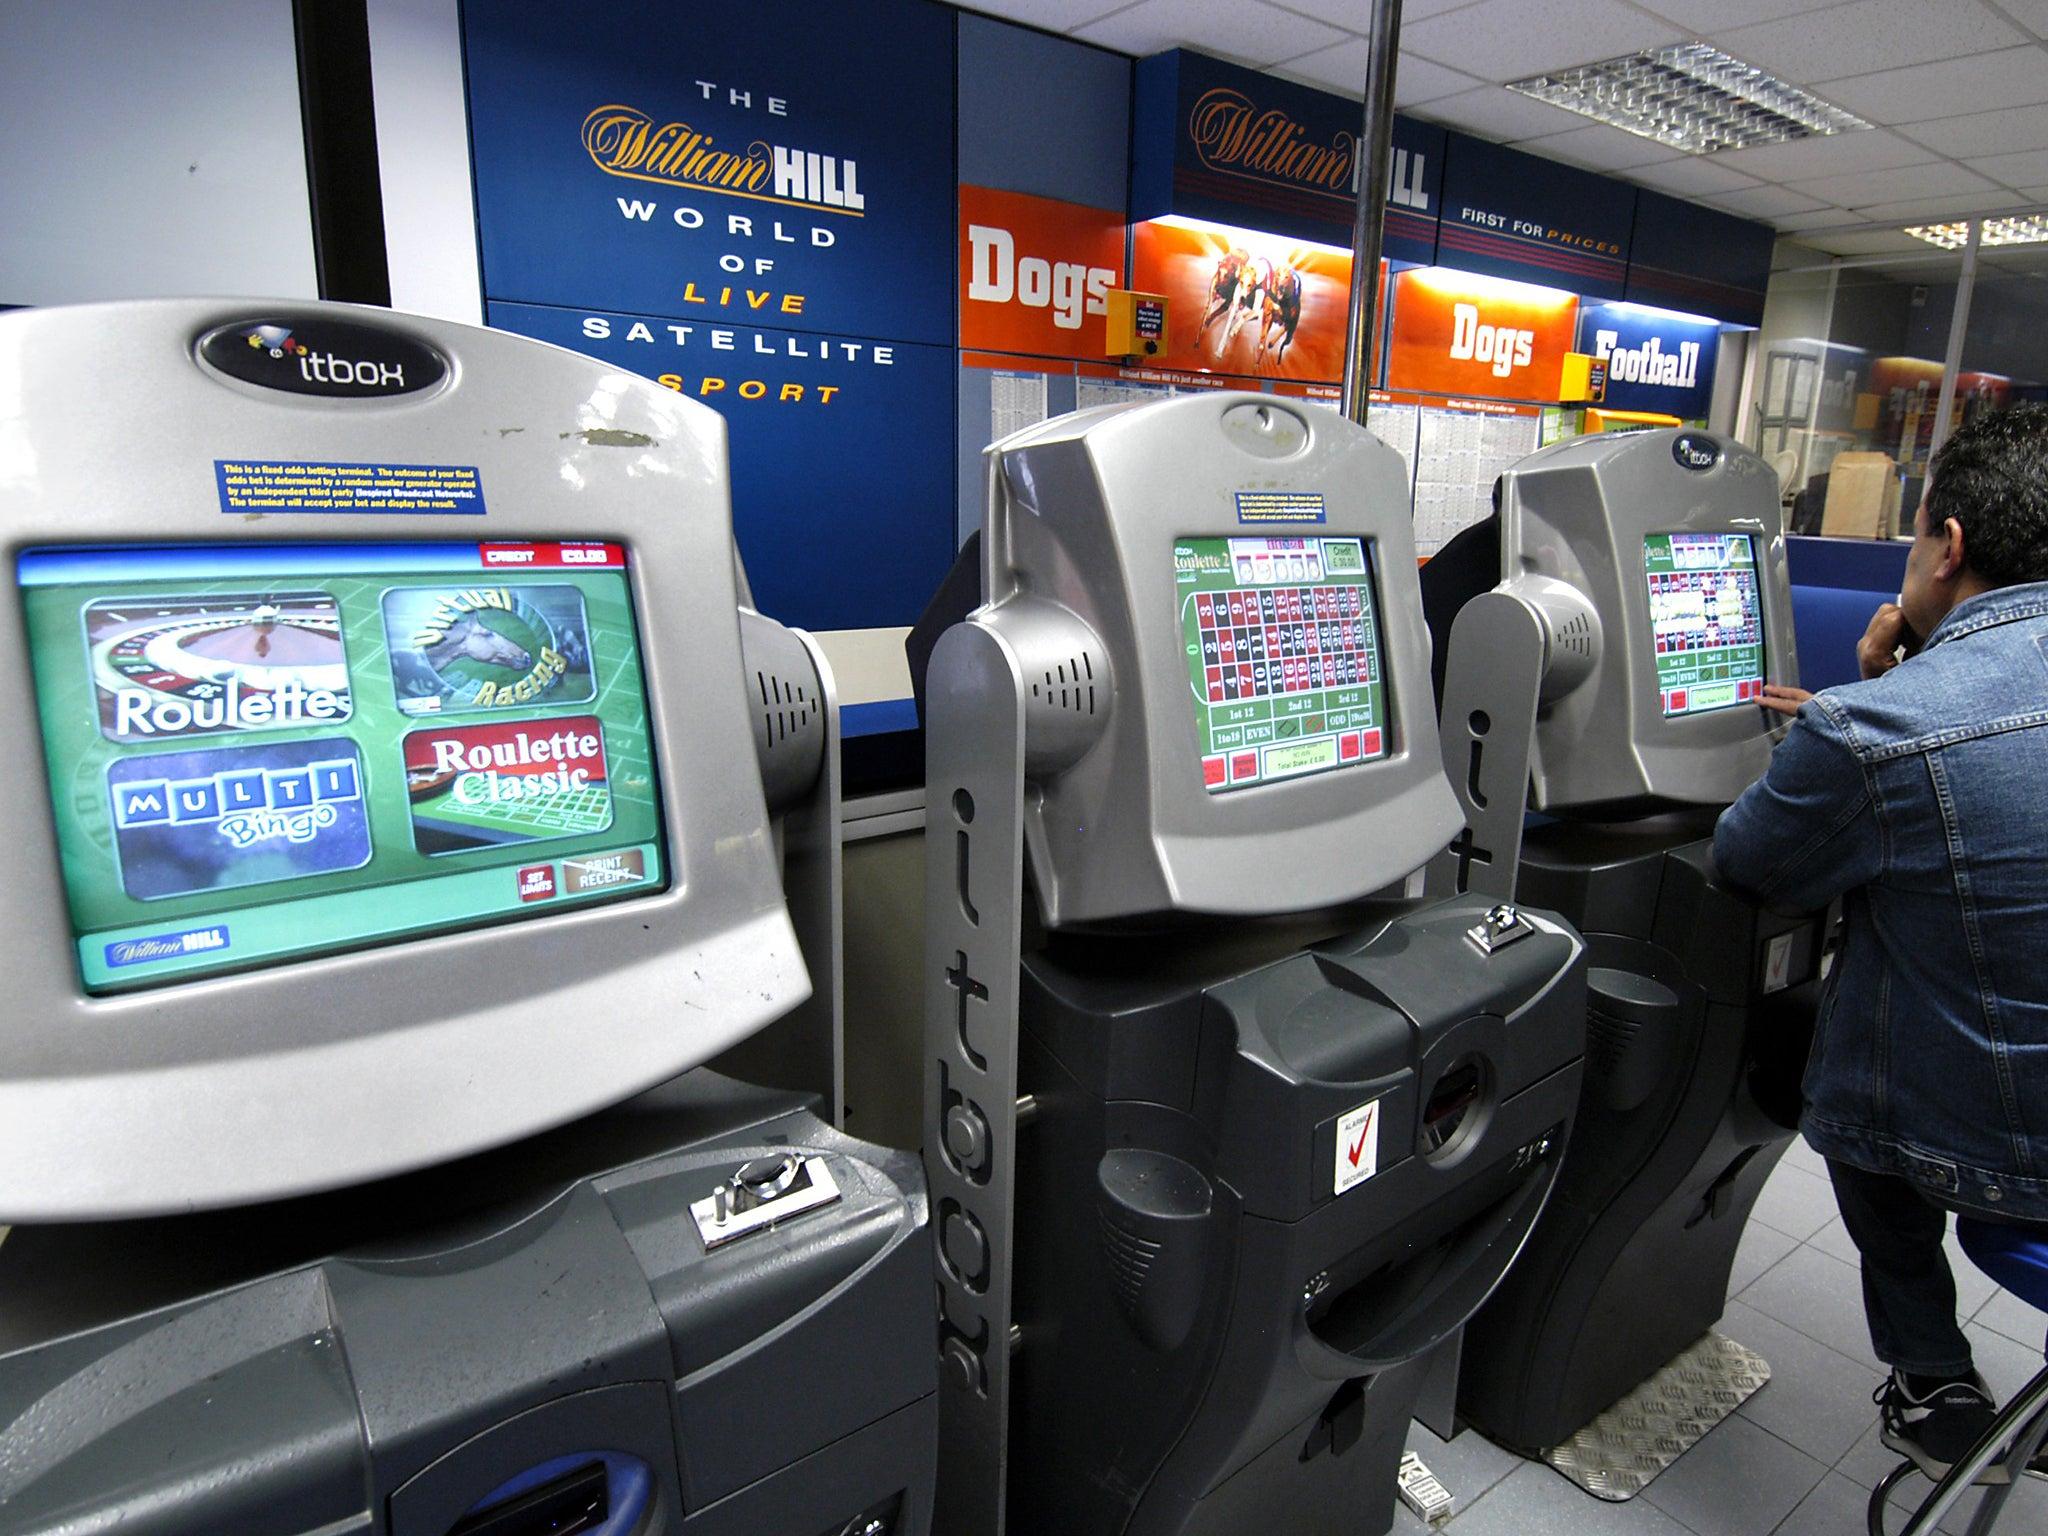 William hill gambling addiction casino connecticut in mohegan sun